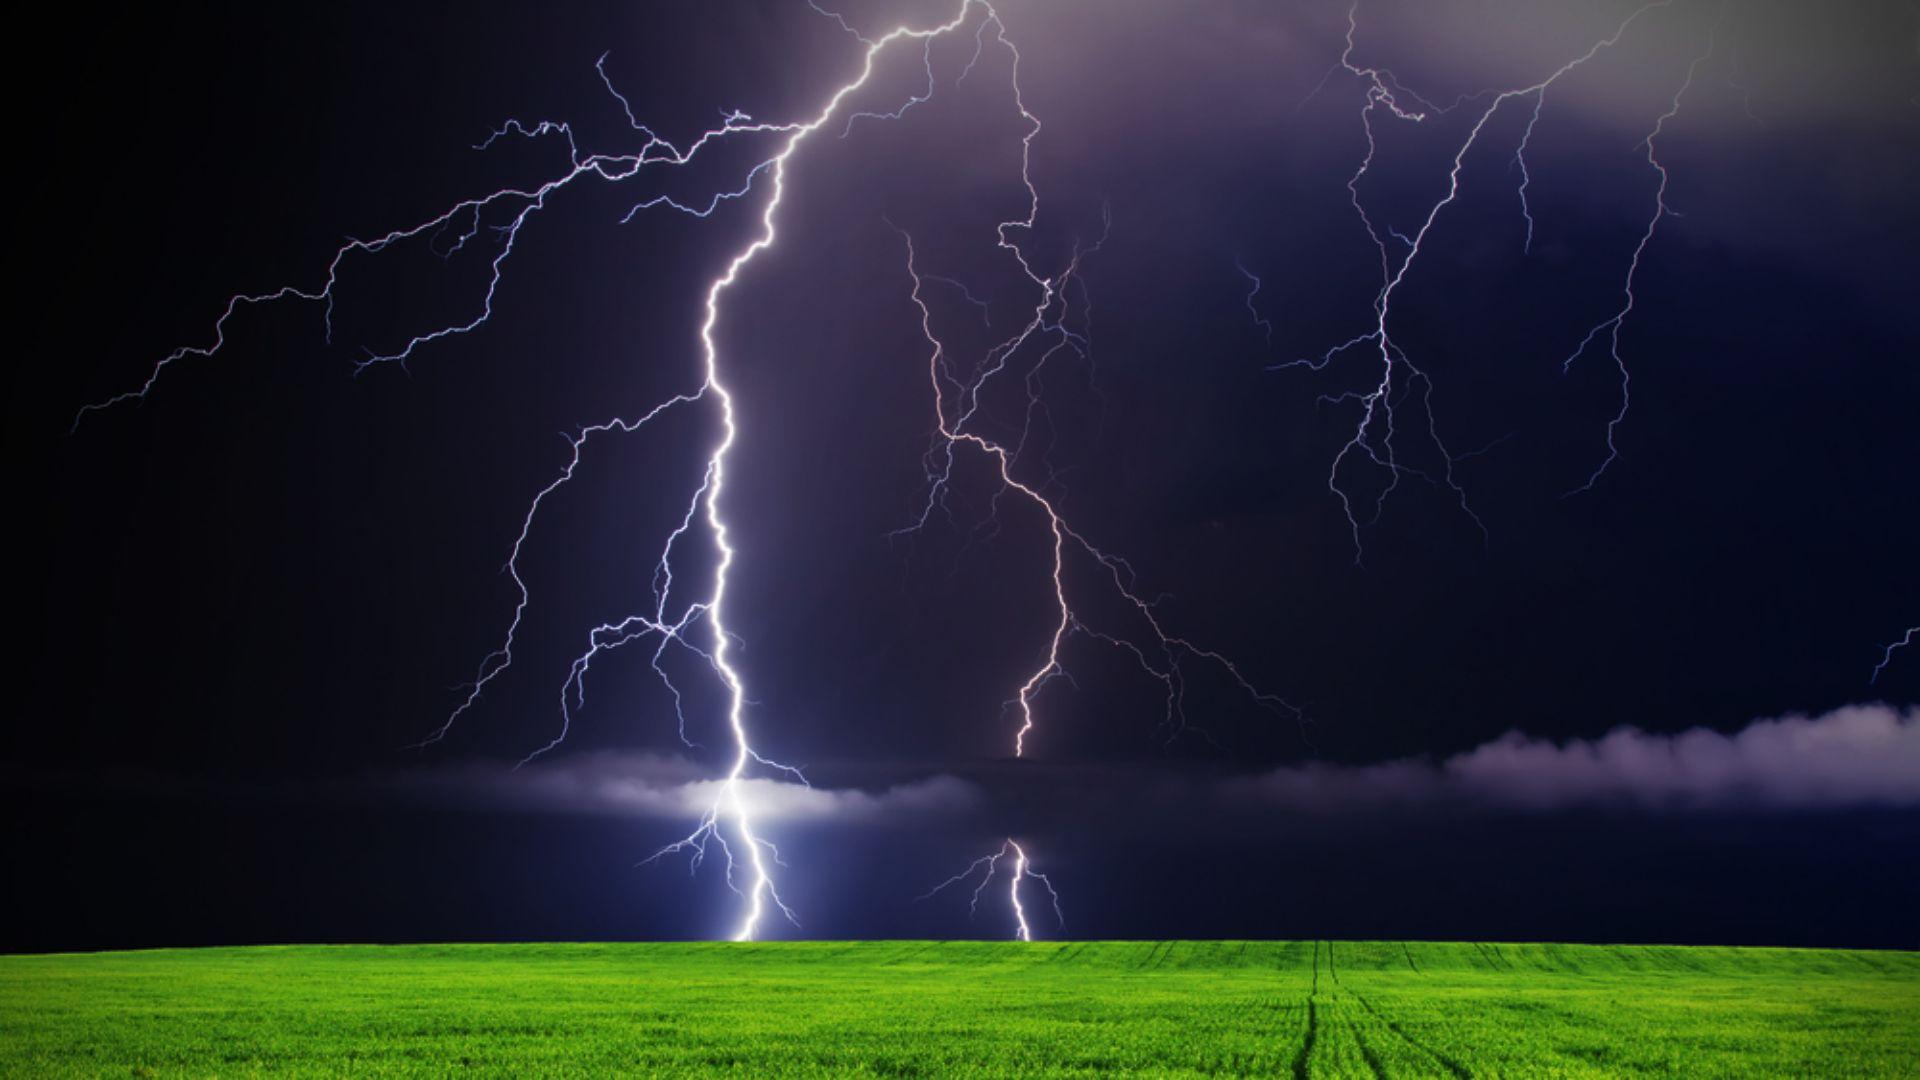 countryside Lightning storm, Storm wallpaper, Volcano